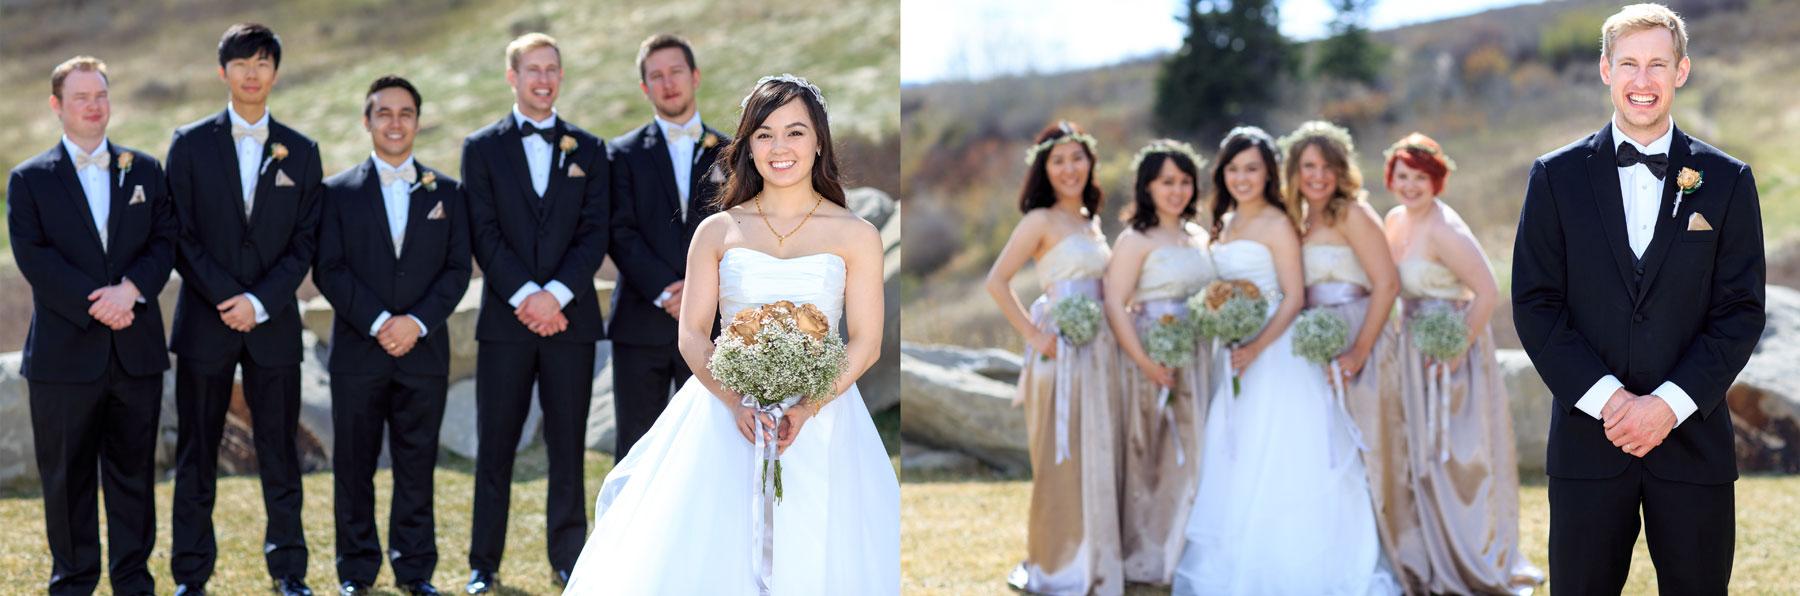 Tina-&-Jordan-Calgary-Wedding-Cochrane-Wedding-Cochrane-Ranchehouse-Olson-Studios-(22)